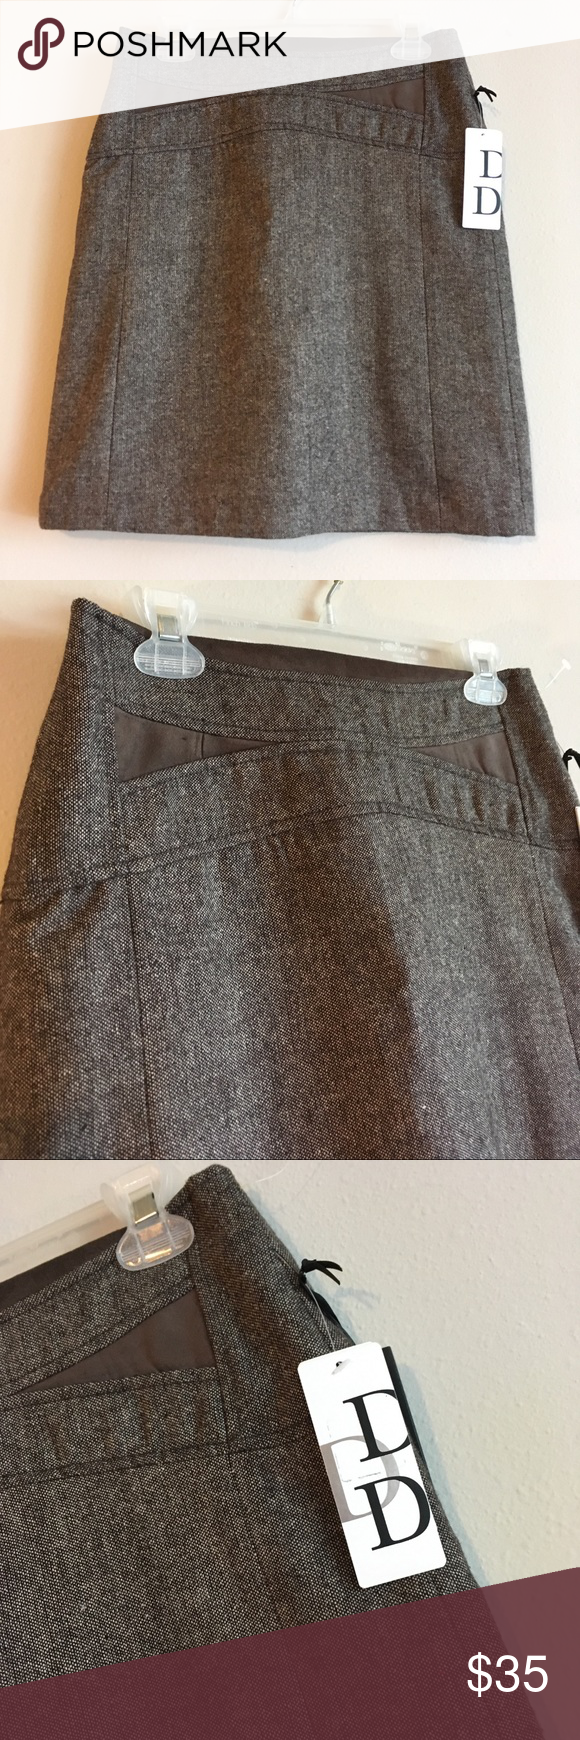 27a8795e9d NWT Twill Marled Brown Pencil Mini Midi Skirt A comfortable, wrinkle free  wool blend pencil